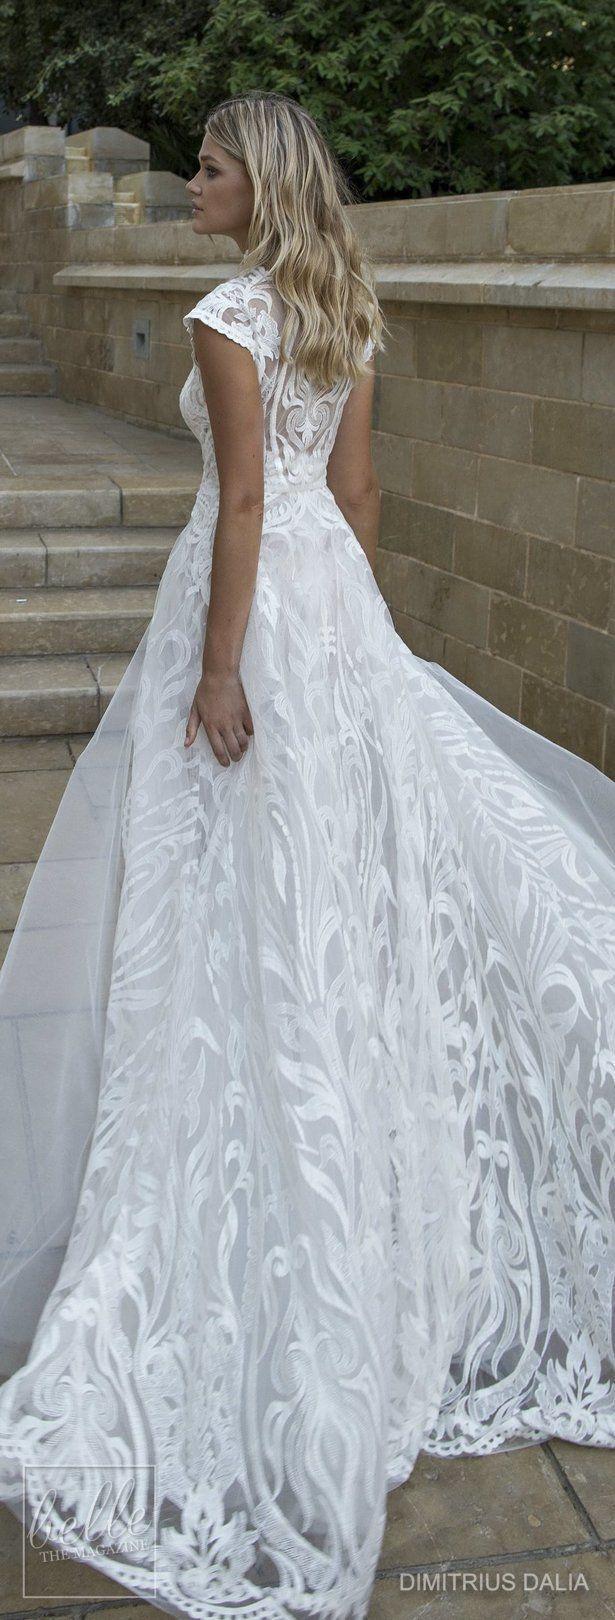 10014 best wedding dresses images on pinterest wedding for Dimitrius dalia wedding dresses